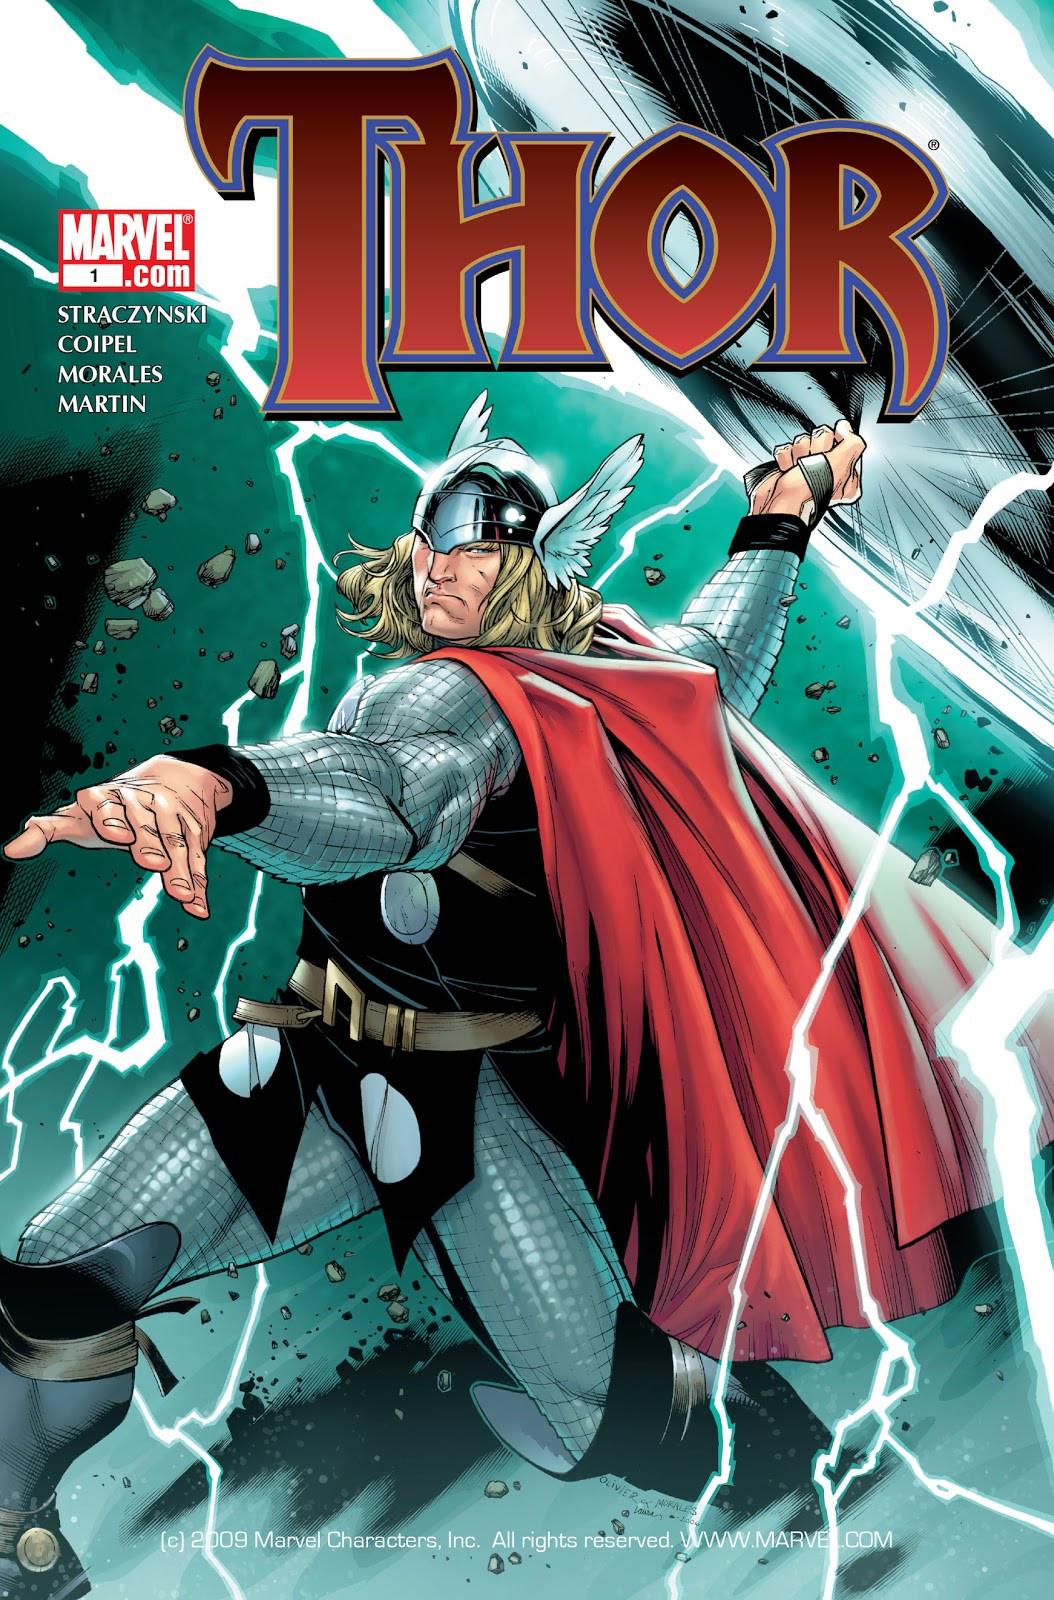 COLECCIÓN DEFINITIVA: THOR [UL] [cbr] Thor_Vol_3_1